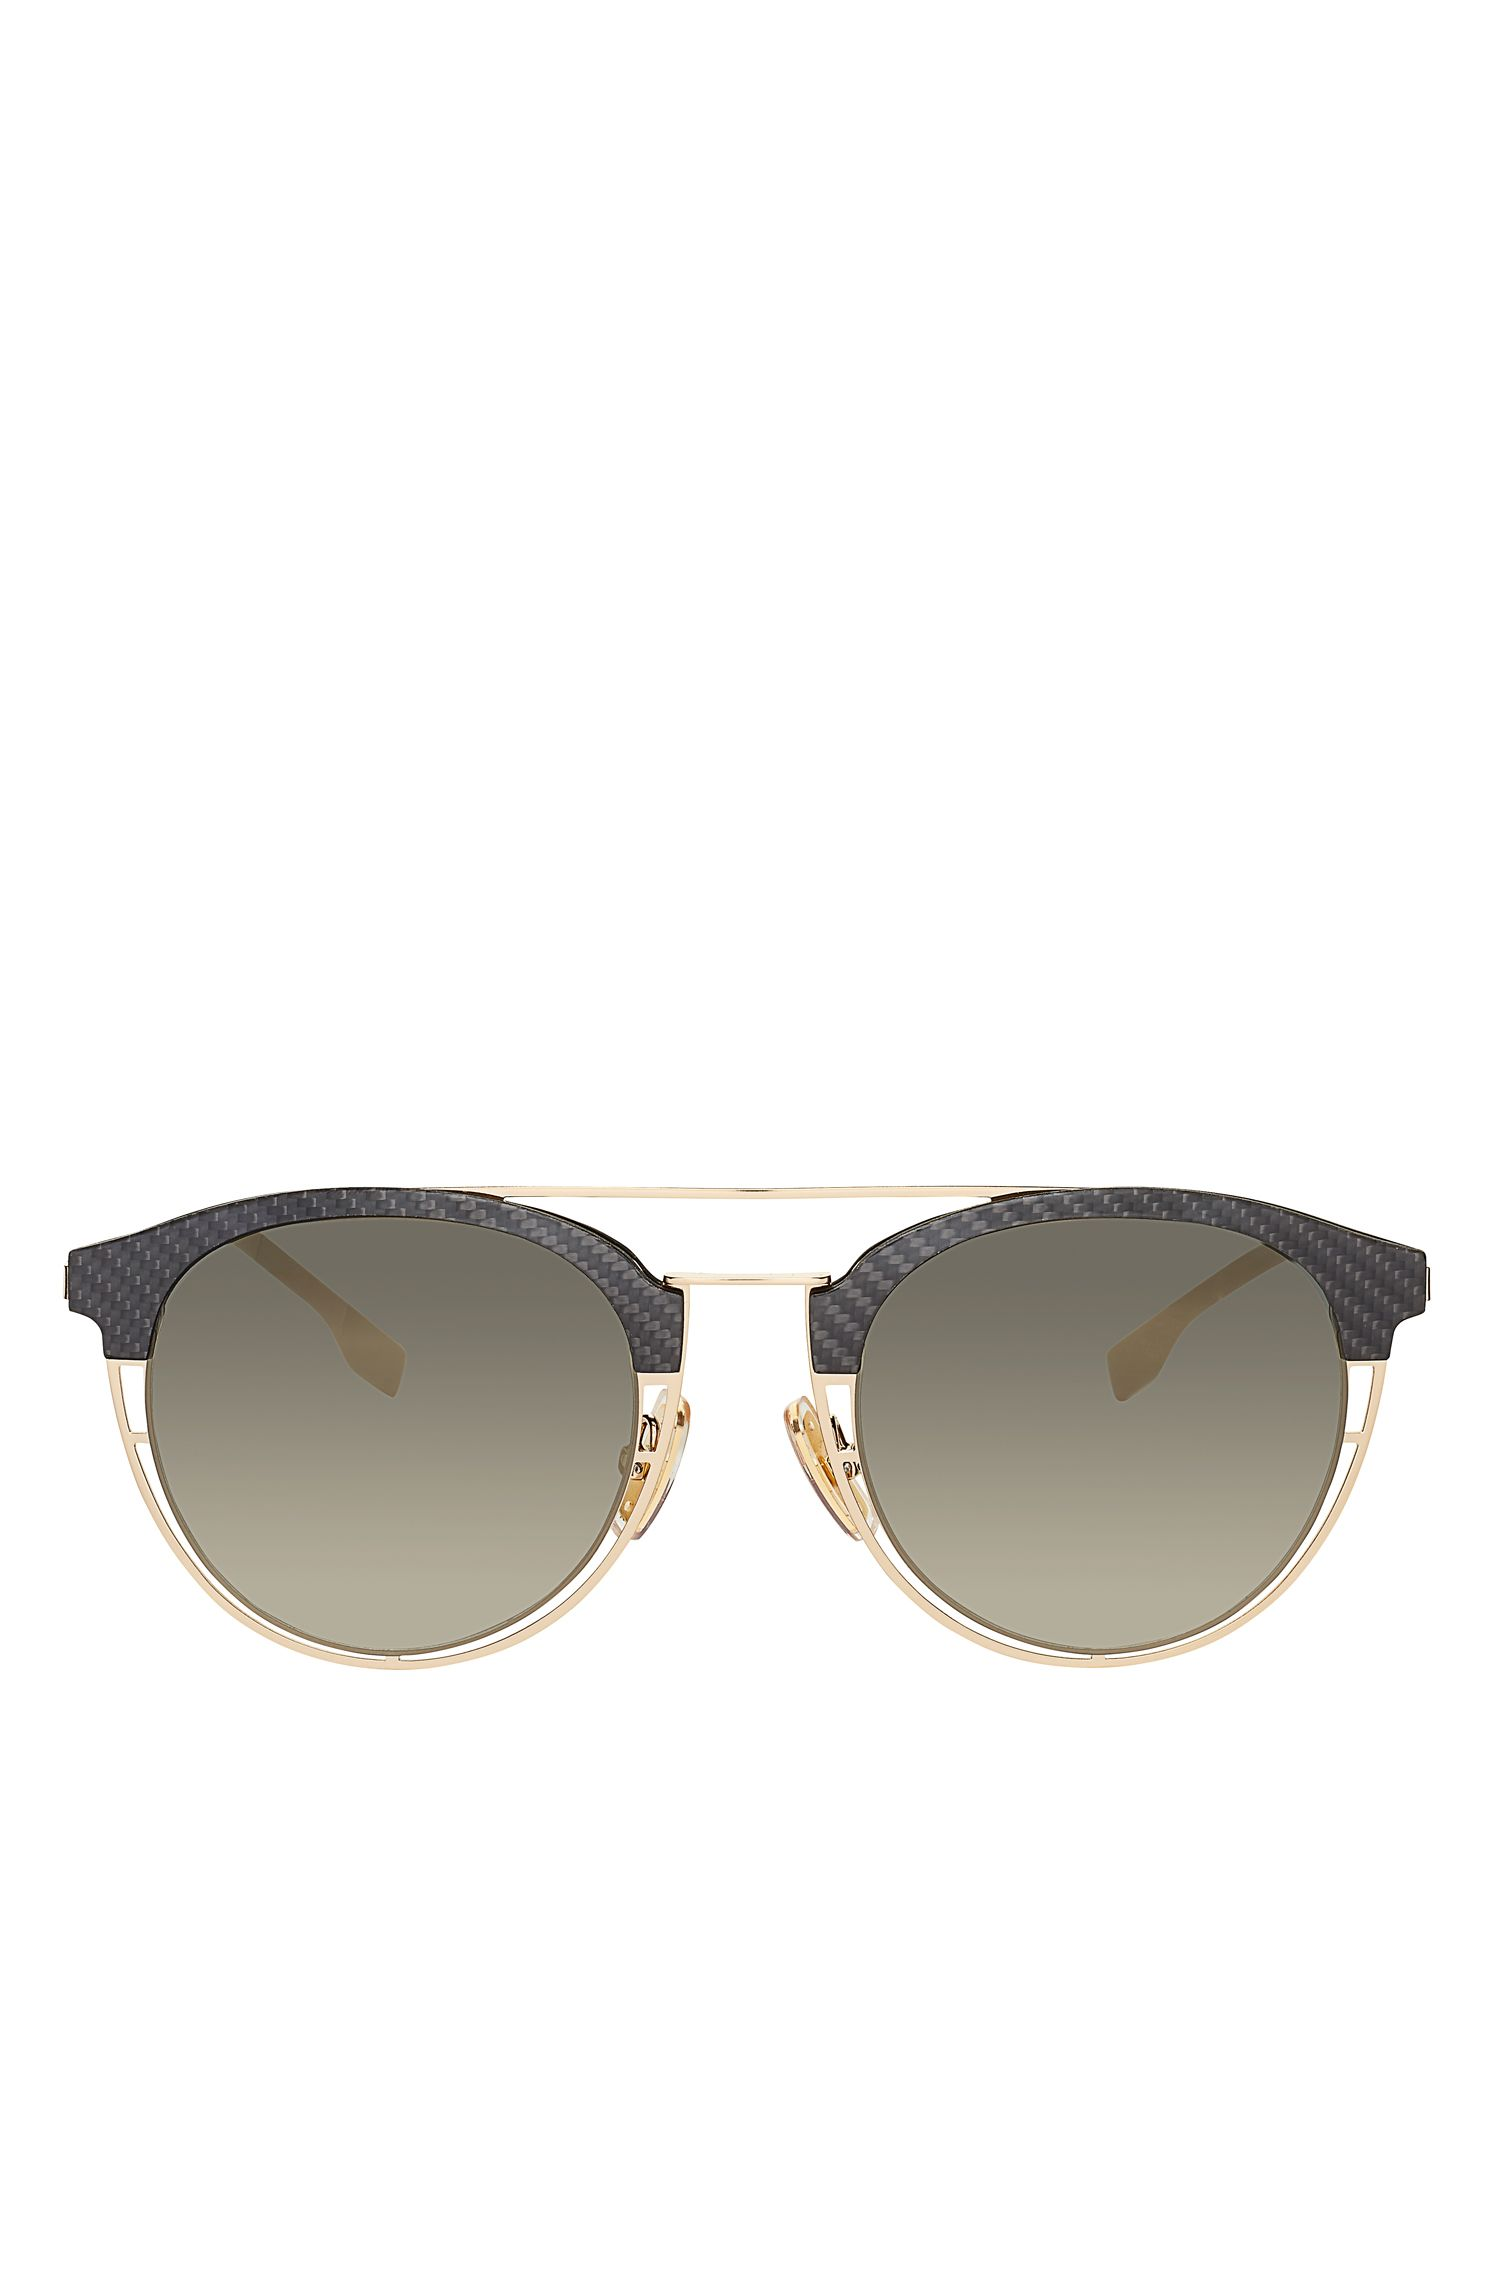 Grey Bronze Lens Sunglasses | BOSS 0784S, Assorted-Pre-Pack